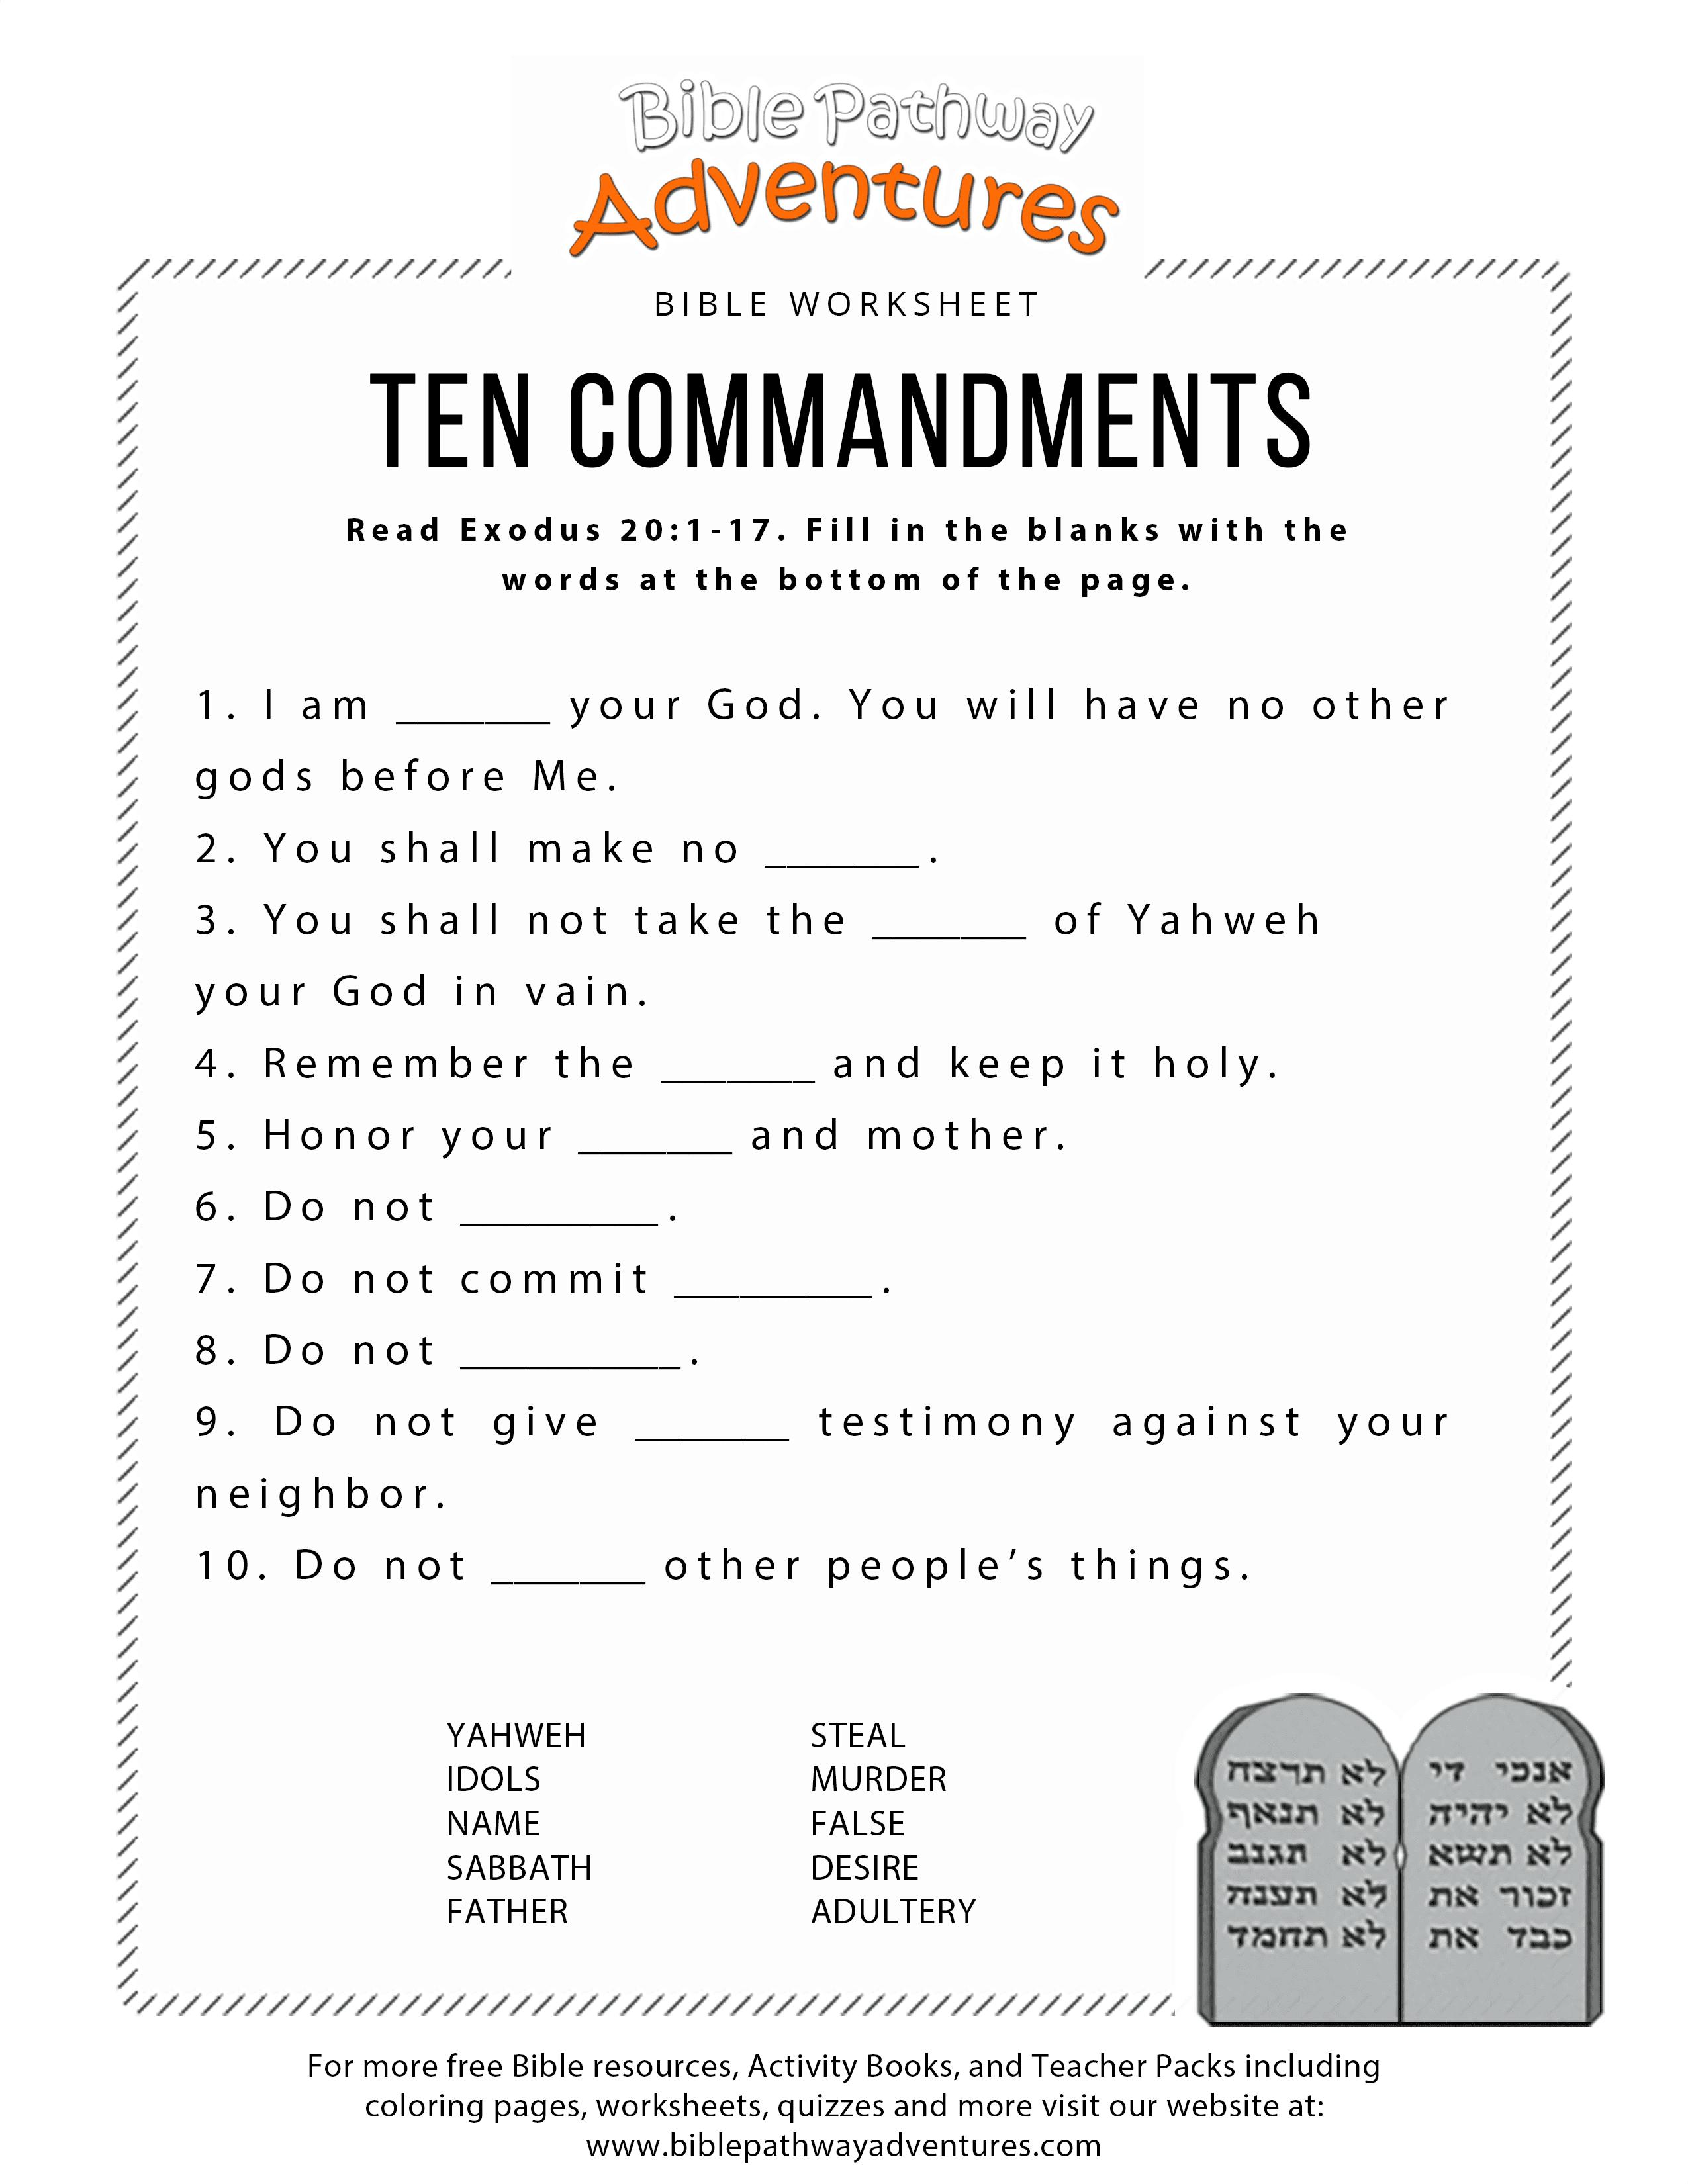 Ten Commandments Worksheet For Kids